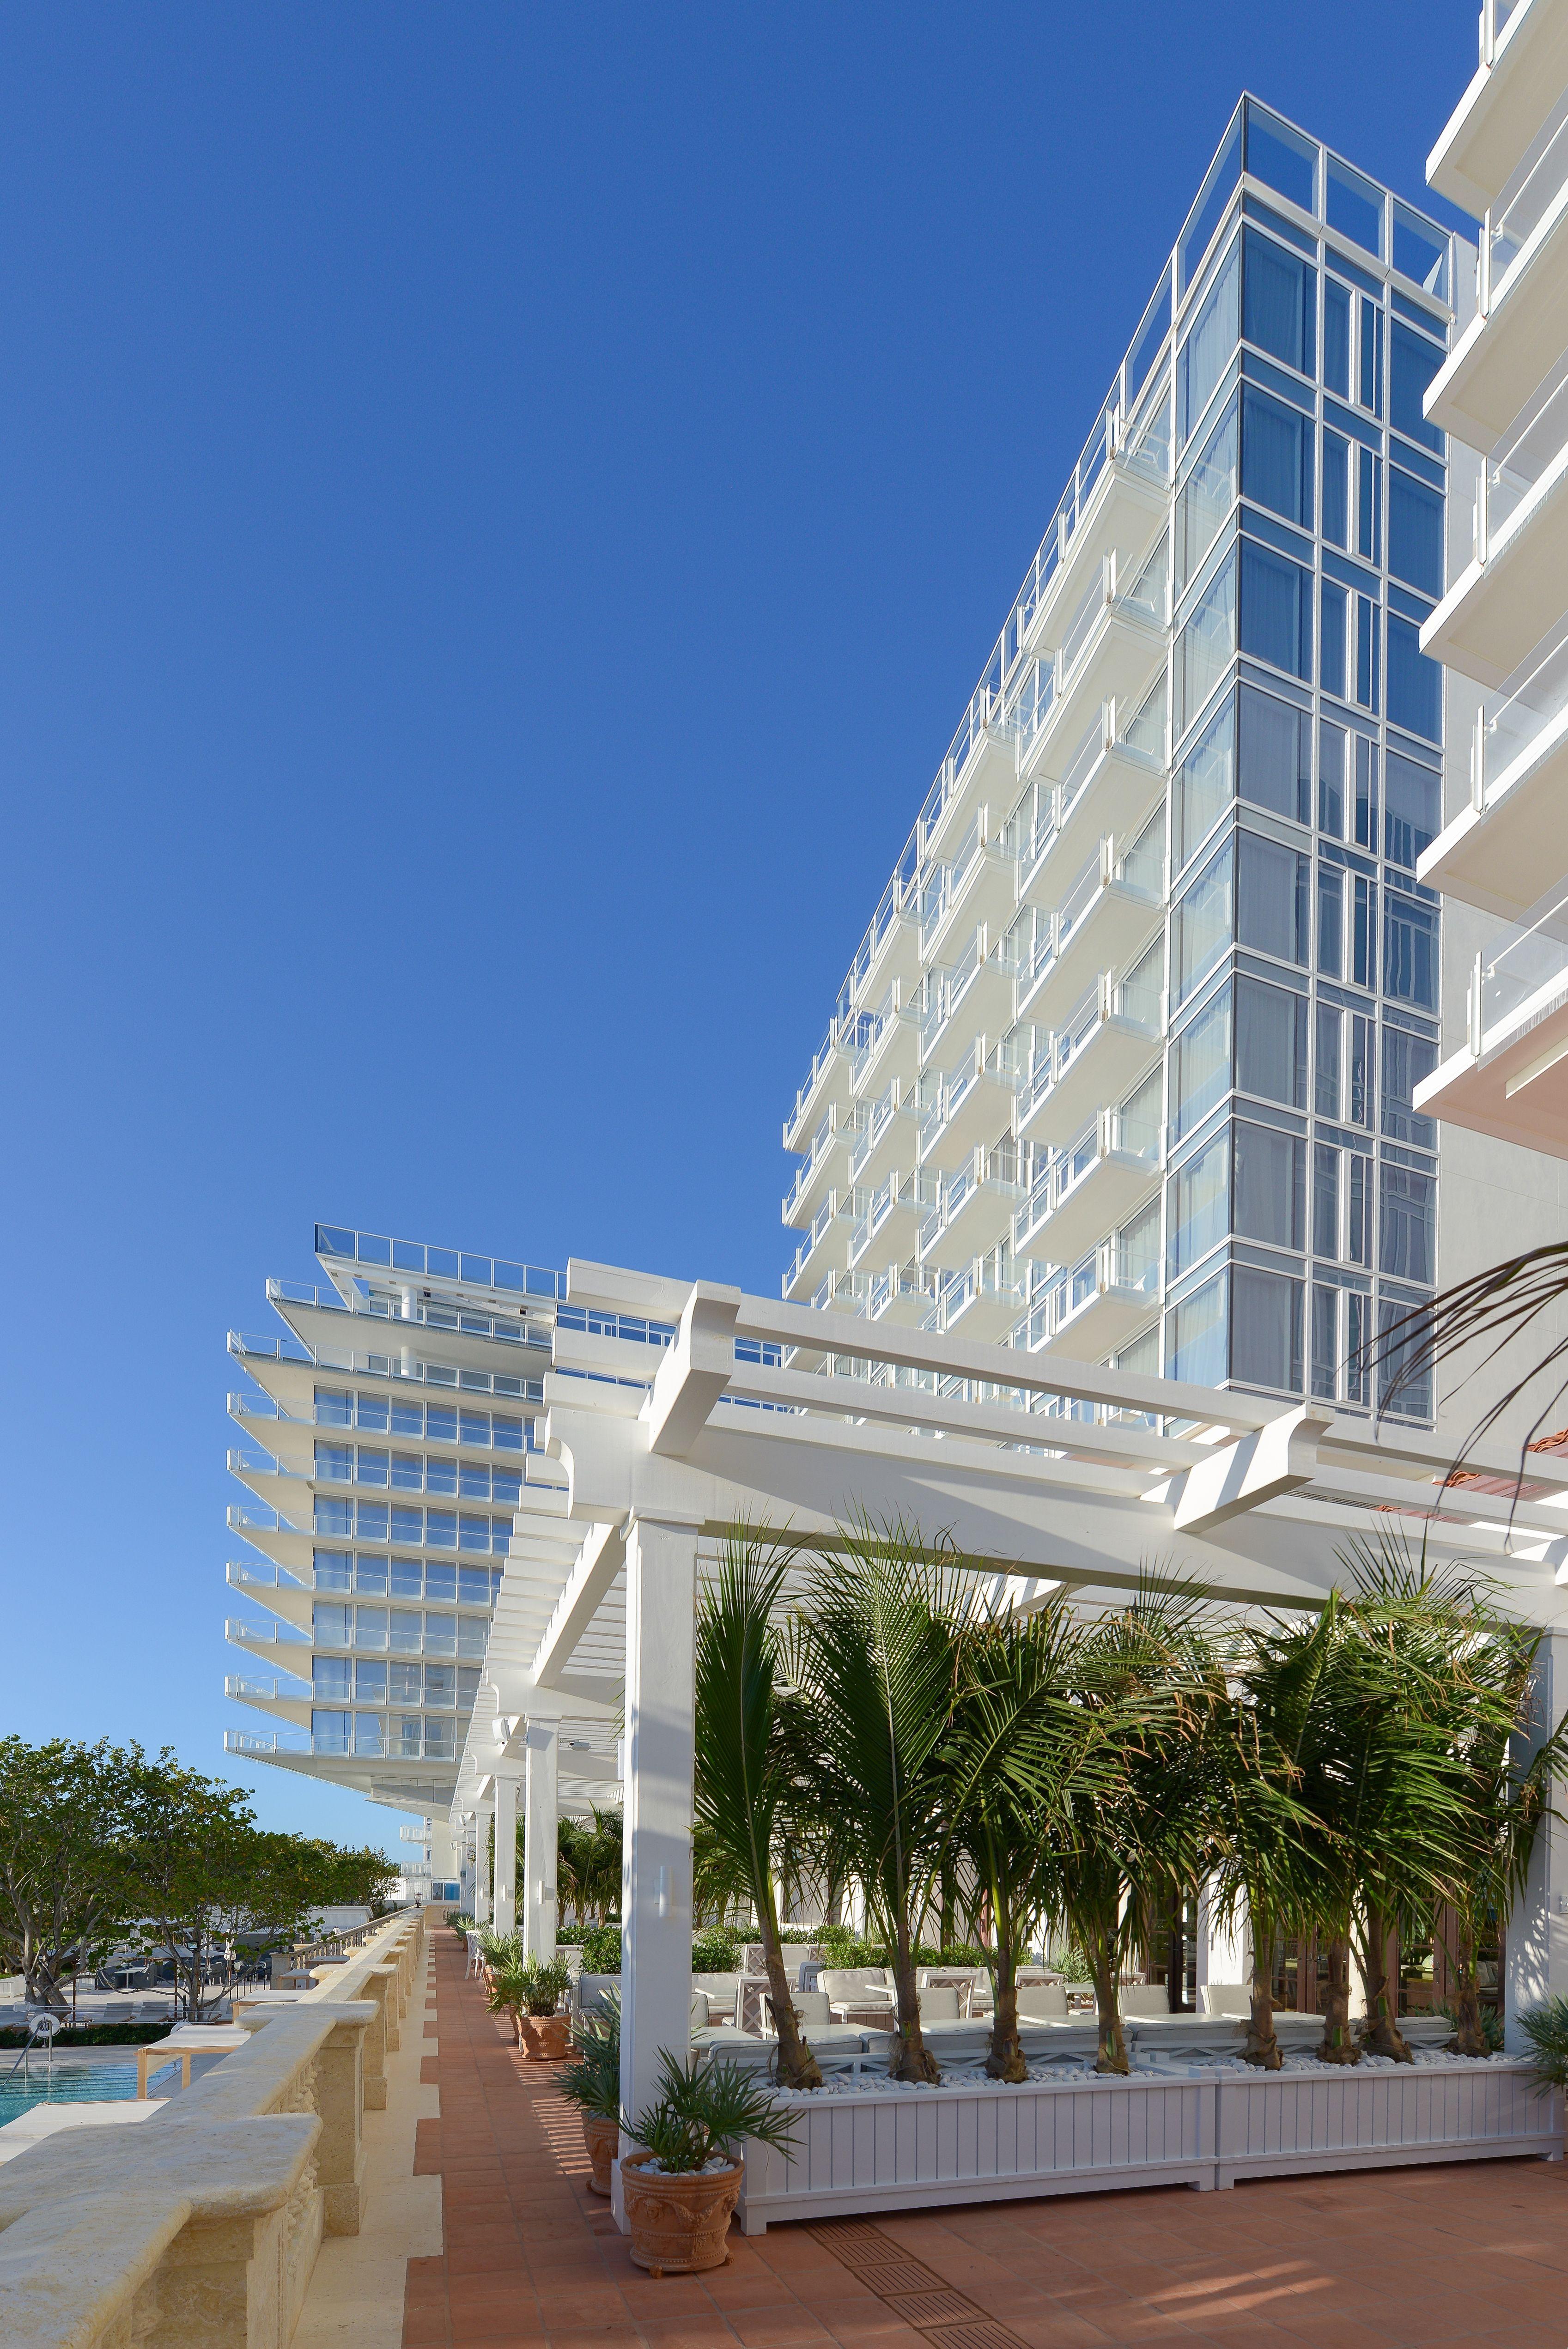 Surf Club Four Seasons. #KobiKarp #Architecture #Design #Miami #Buildings #ArchiLovers